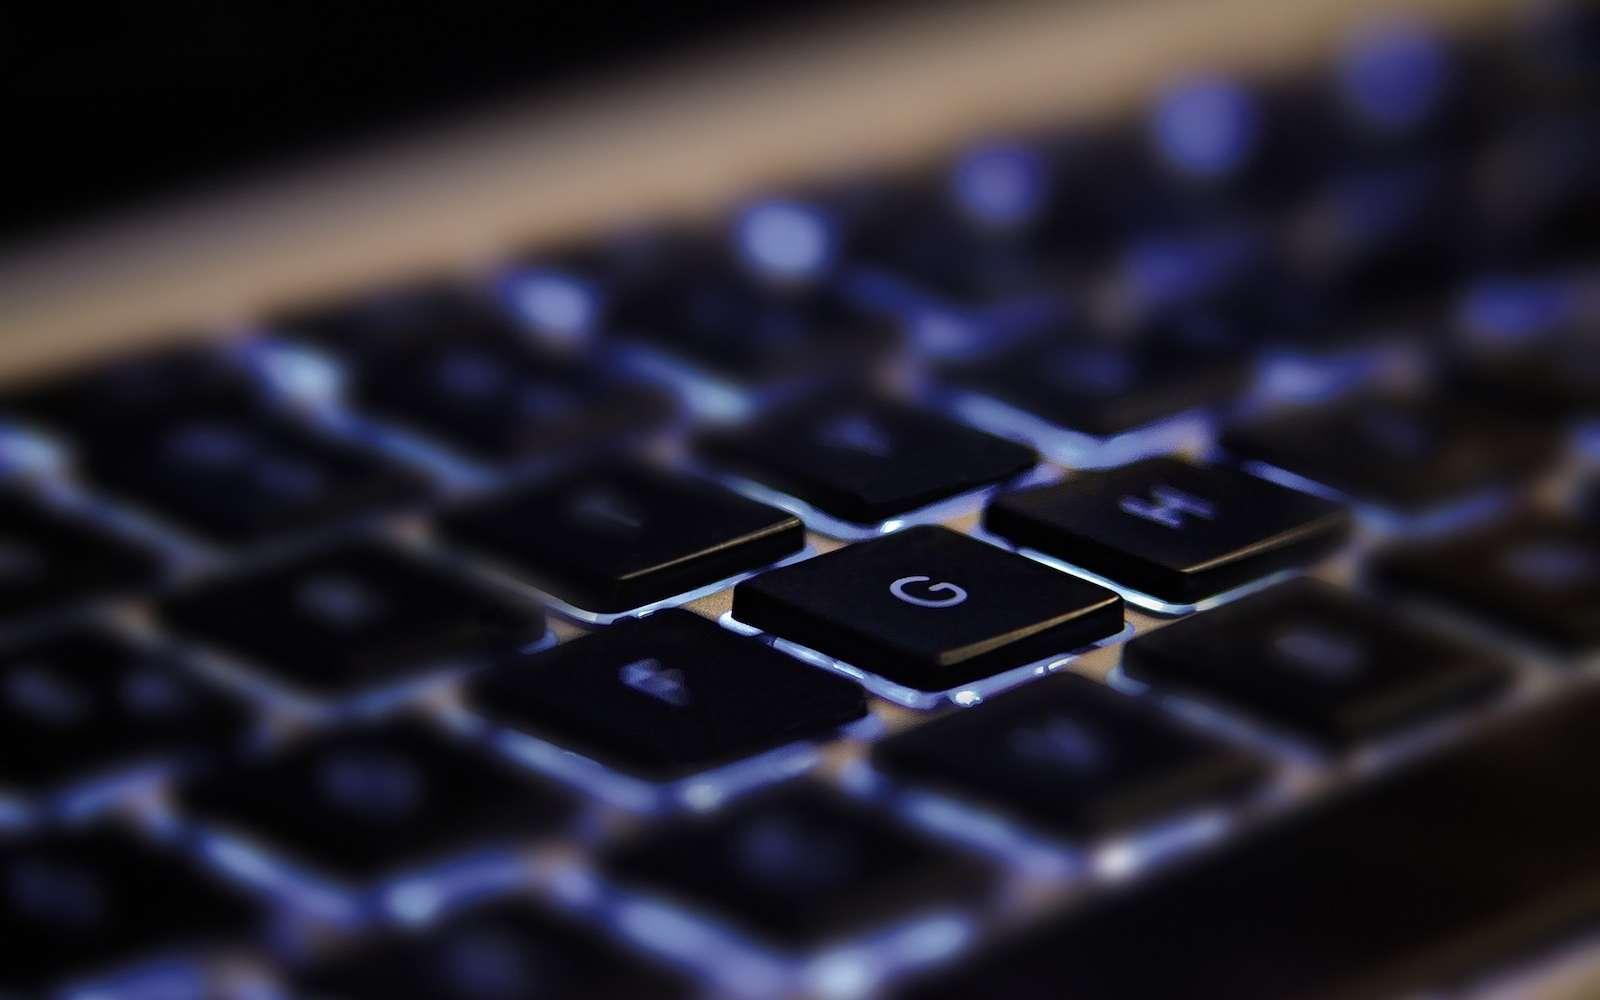 Clavier informatique. © Pixies, Pixabay